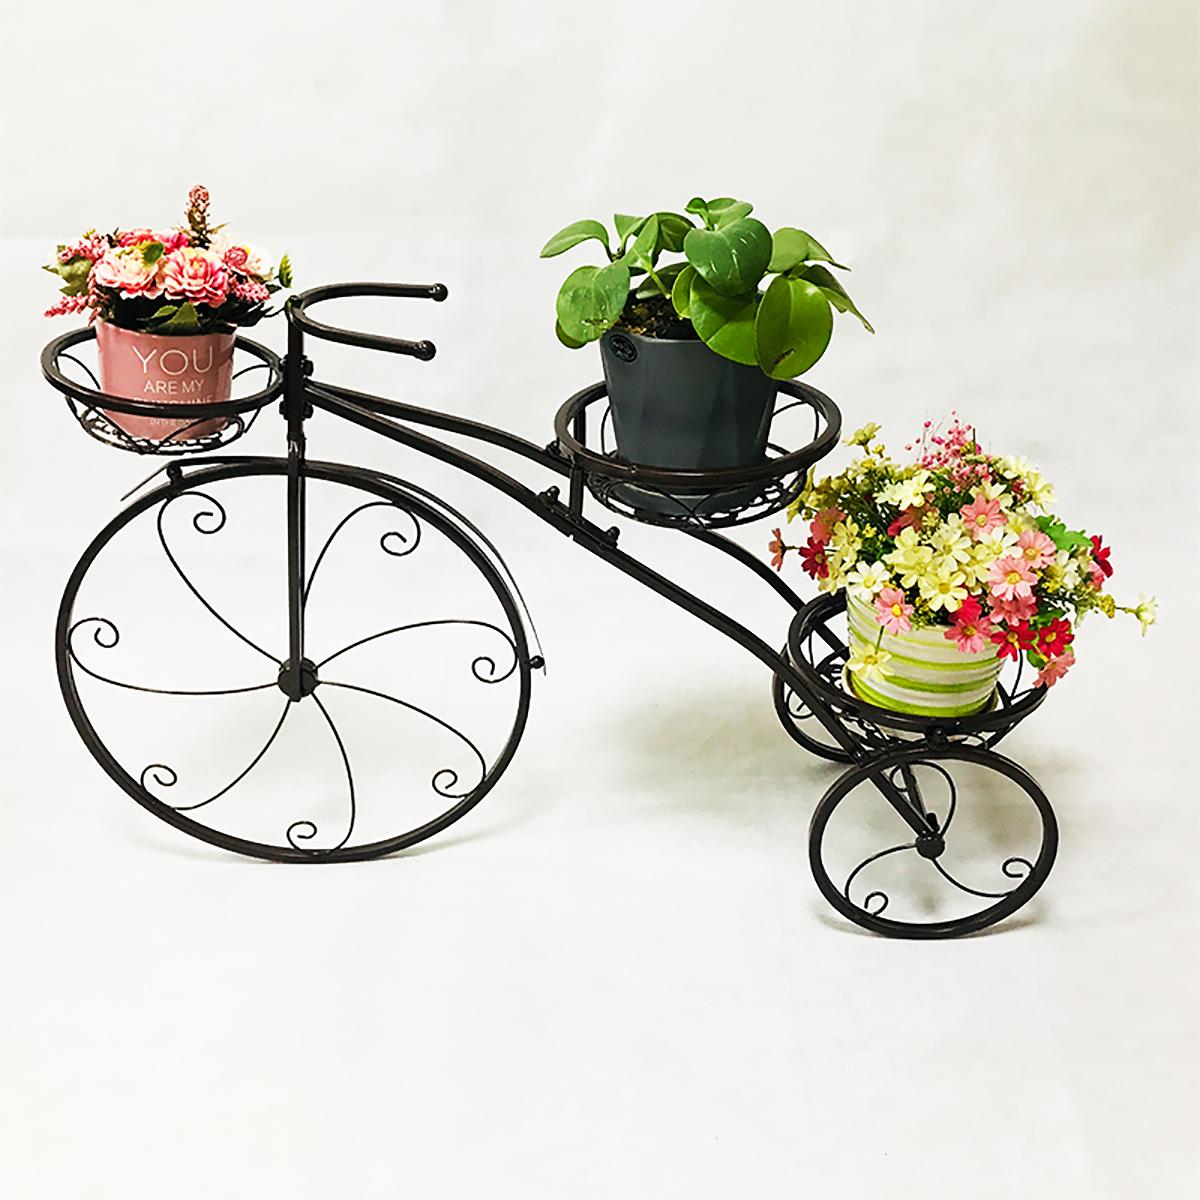 3 Tier Bicycles Plant Stand Metal Flower Pots Garden Decor Shelf Rack 5